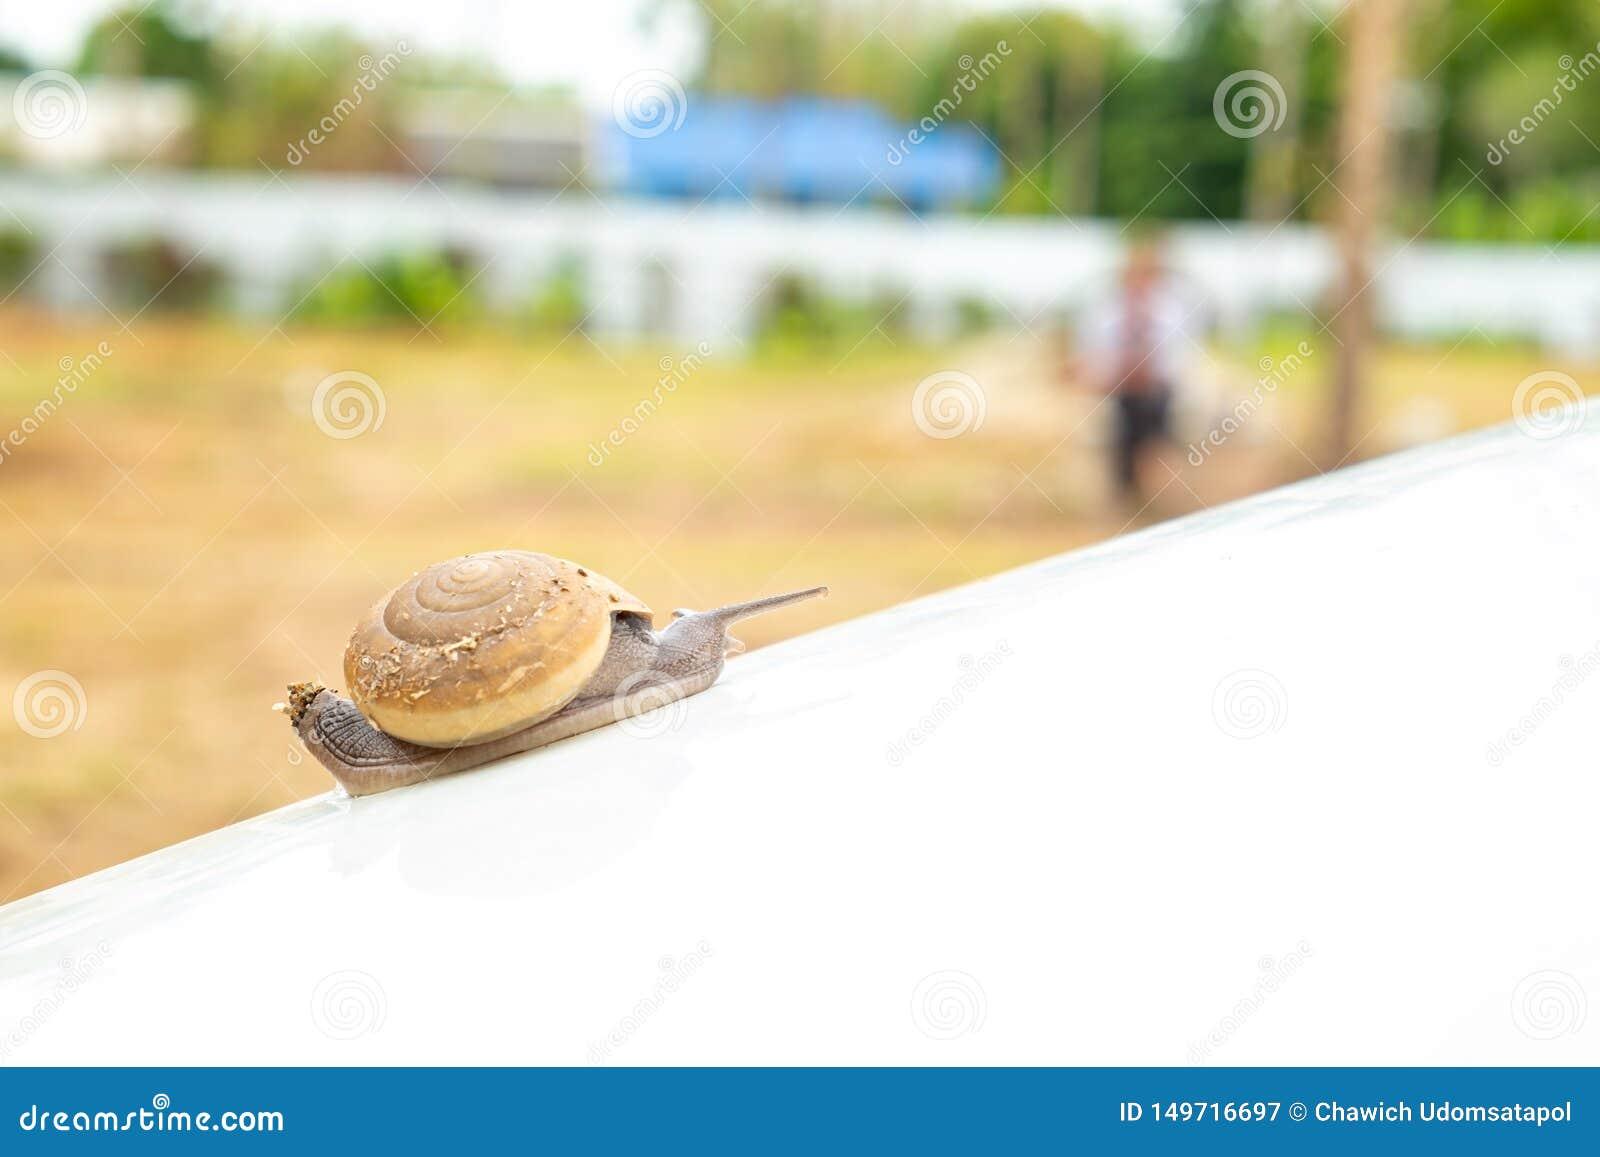 Snail crawling slowly on white bonnet